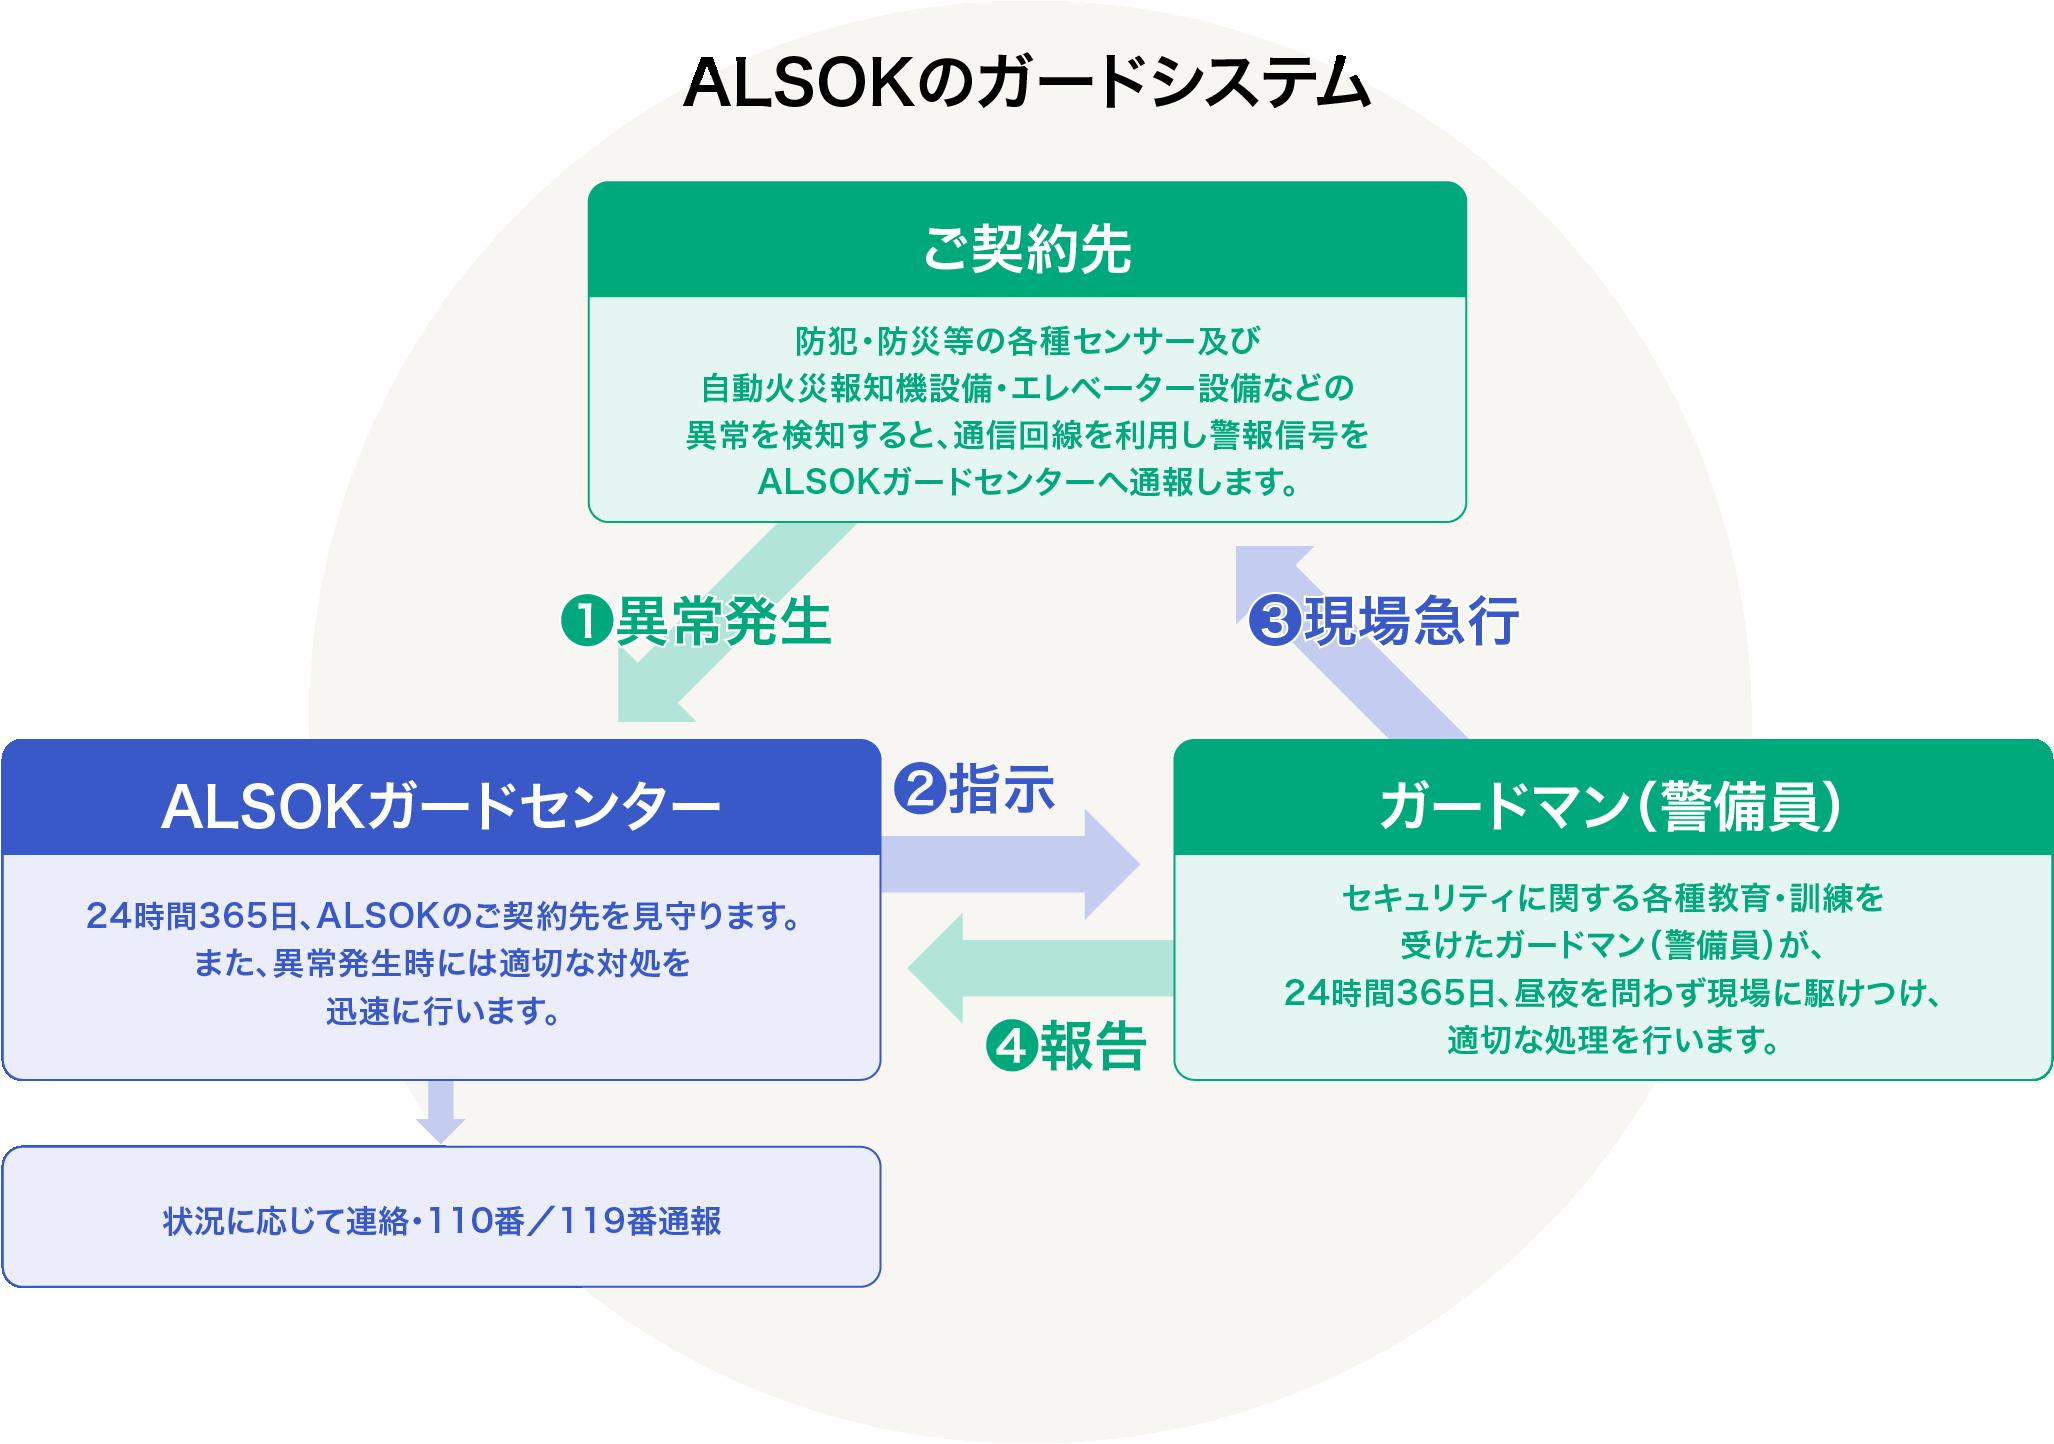 ALSOKのガードシステム